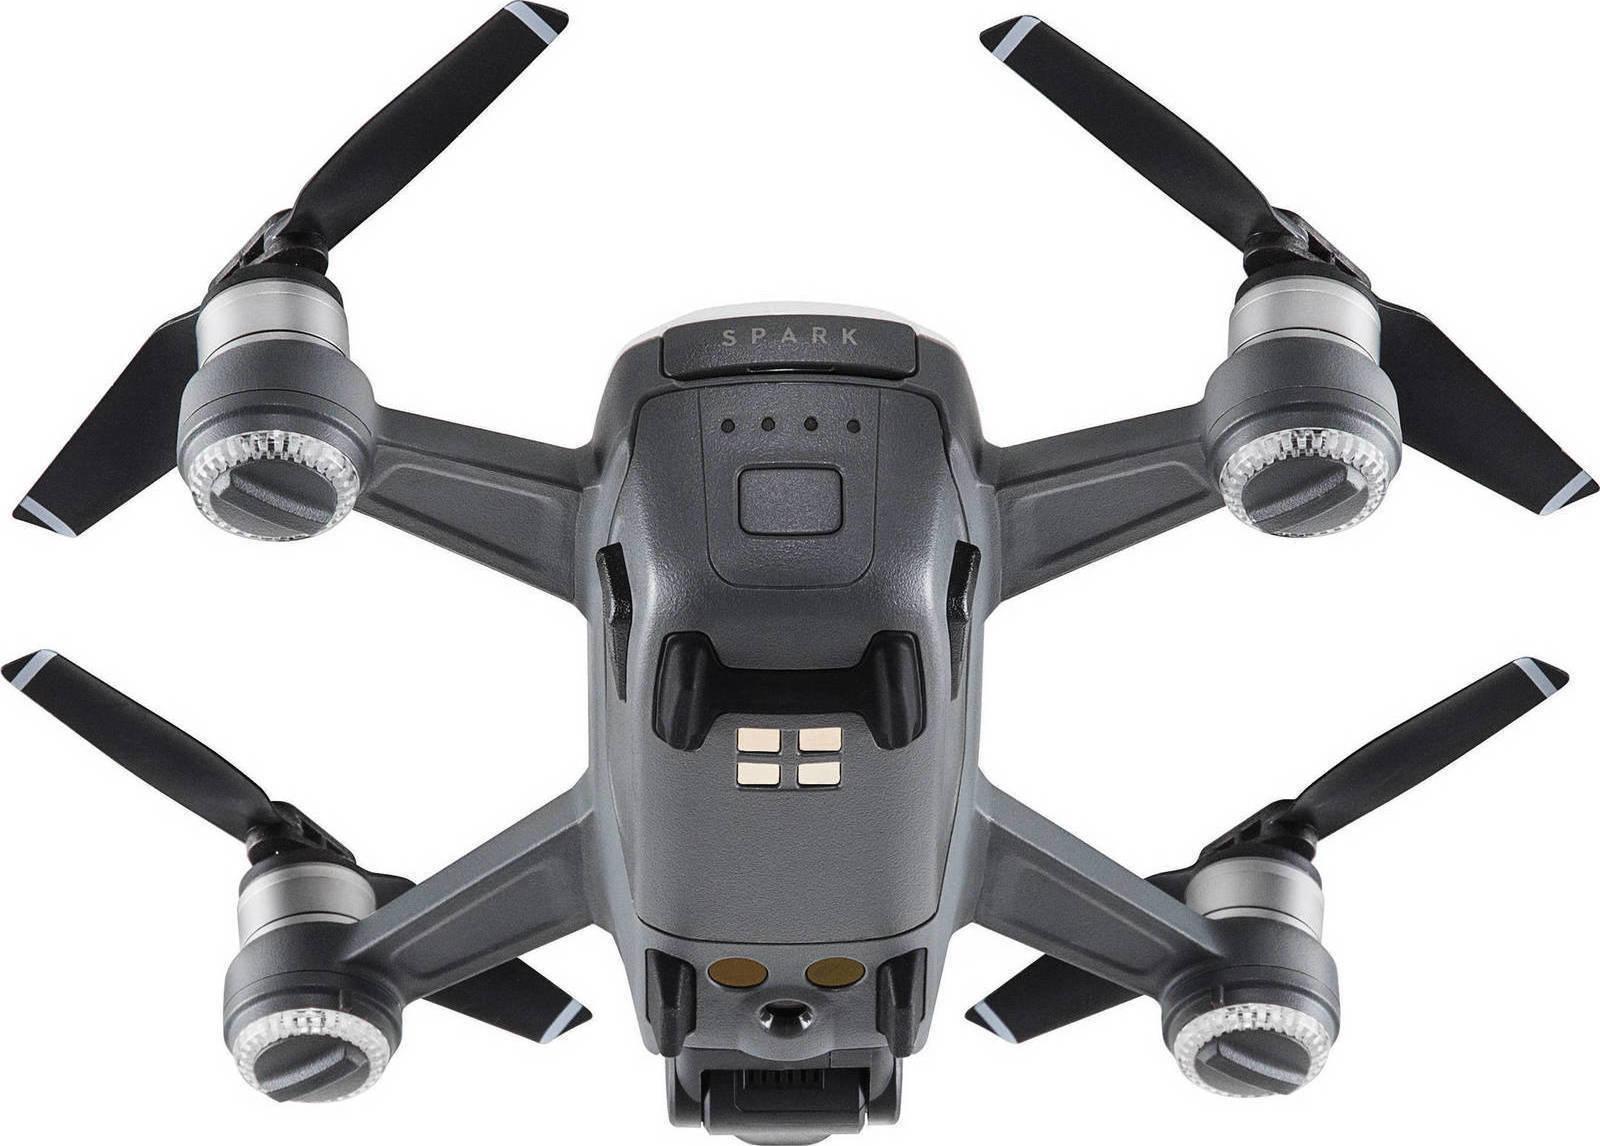 DJI Spark Fly More Combo Drone Sky Blue Πληρωμή έως 12 δόσεις